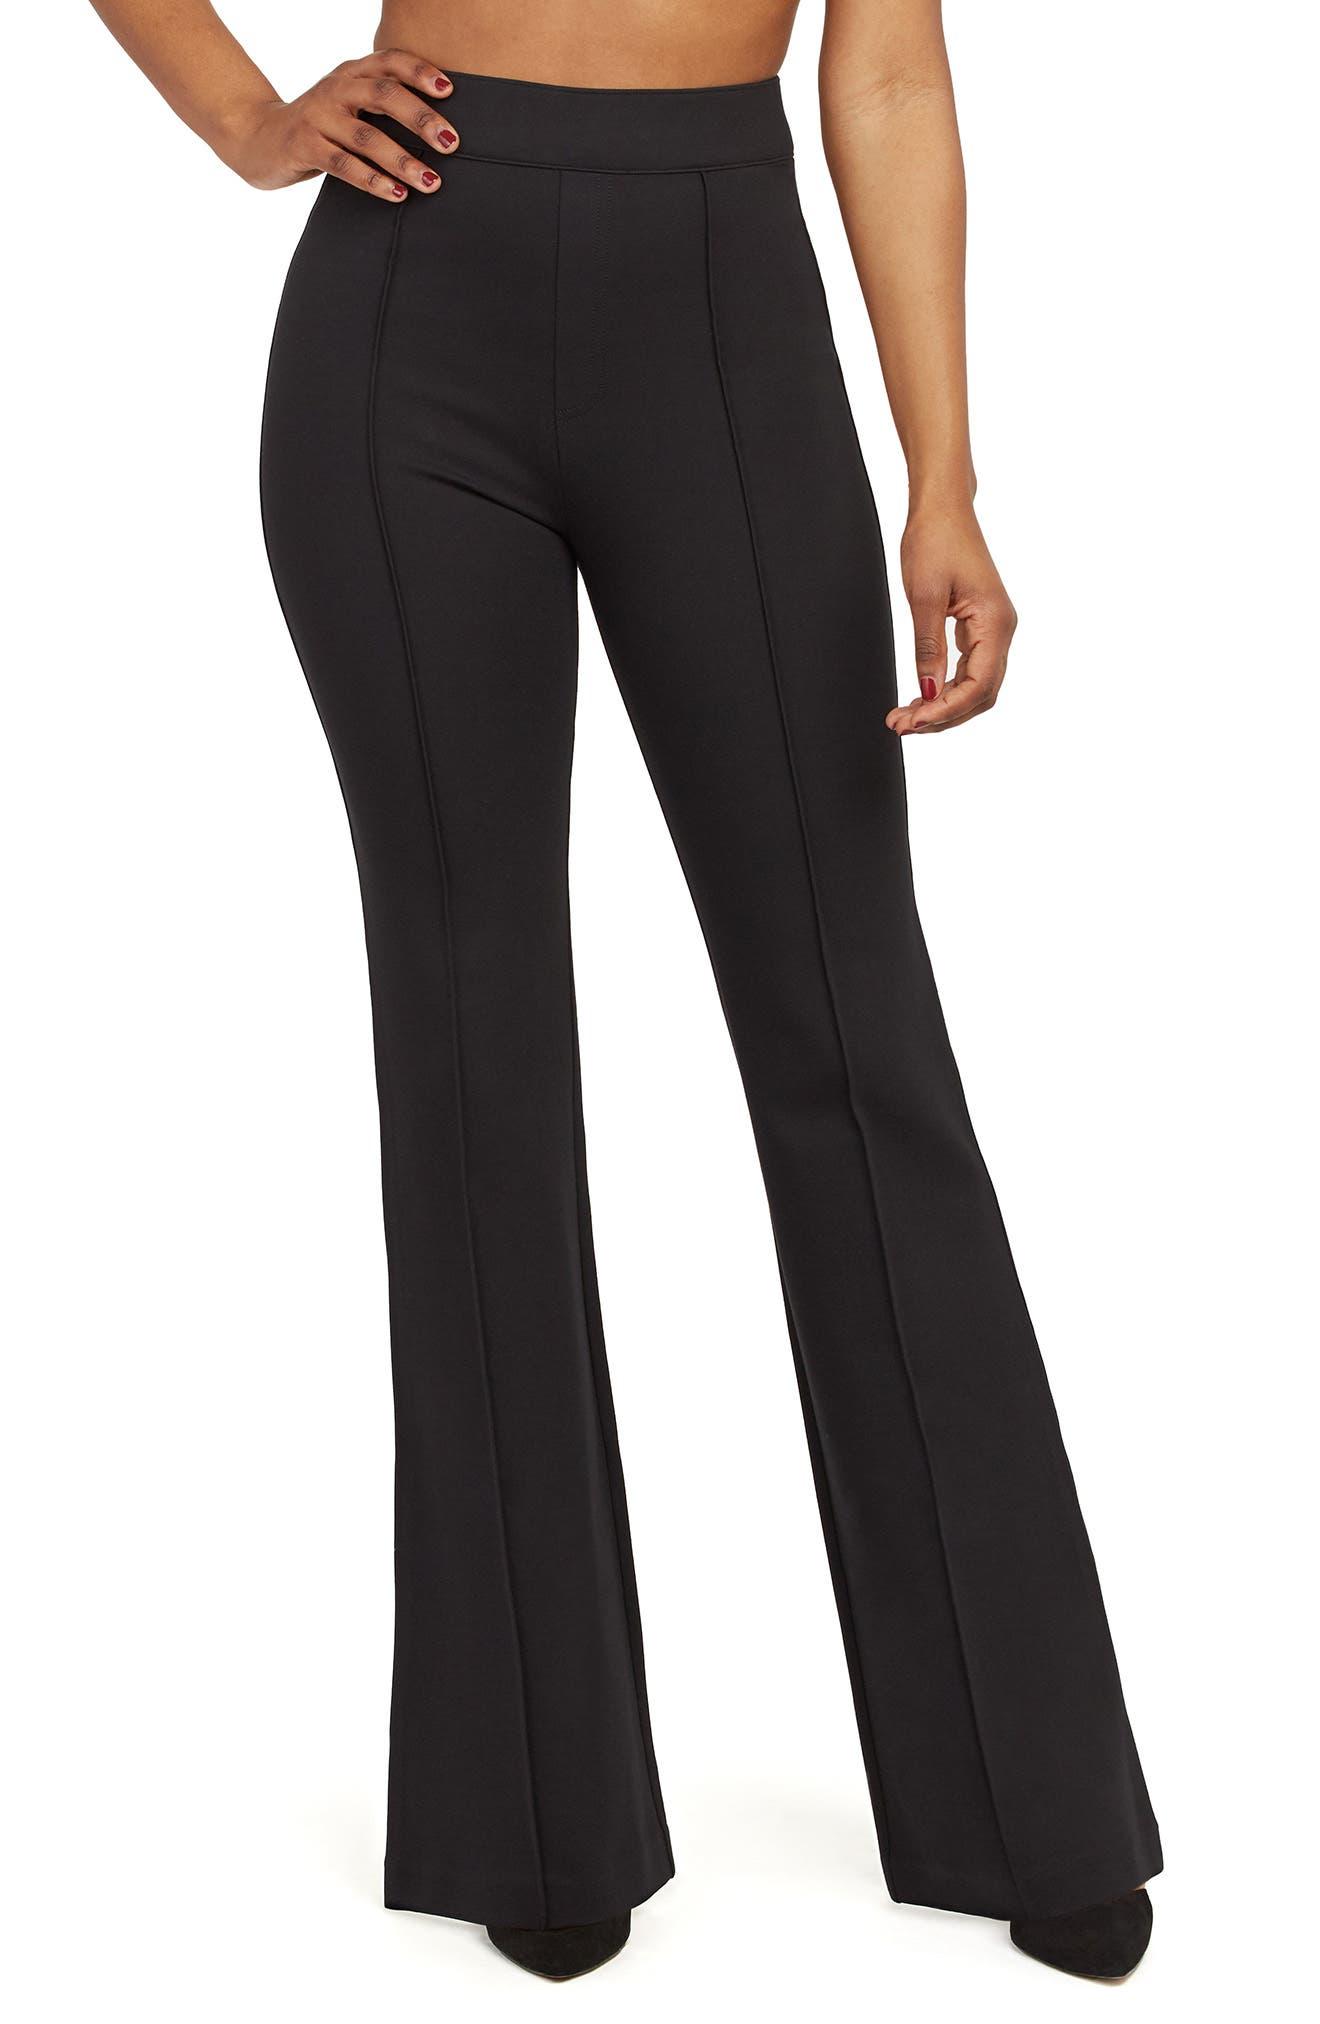 Plus Women's Spanx Flare Ponte Pants